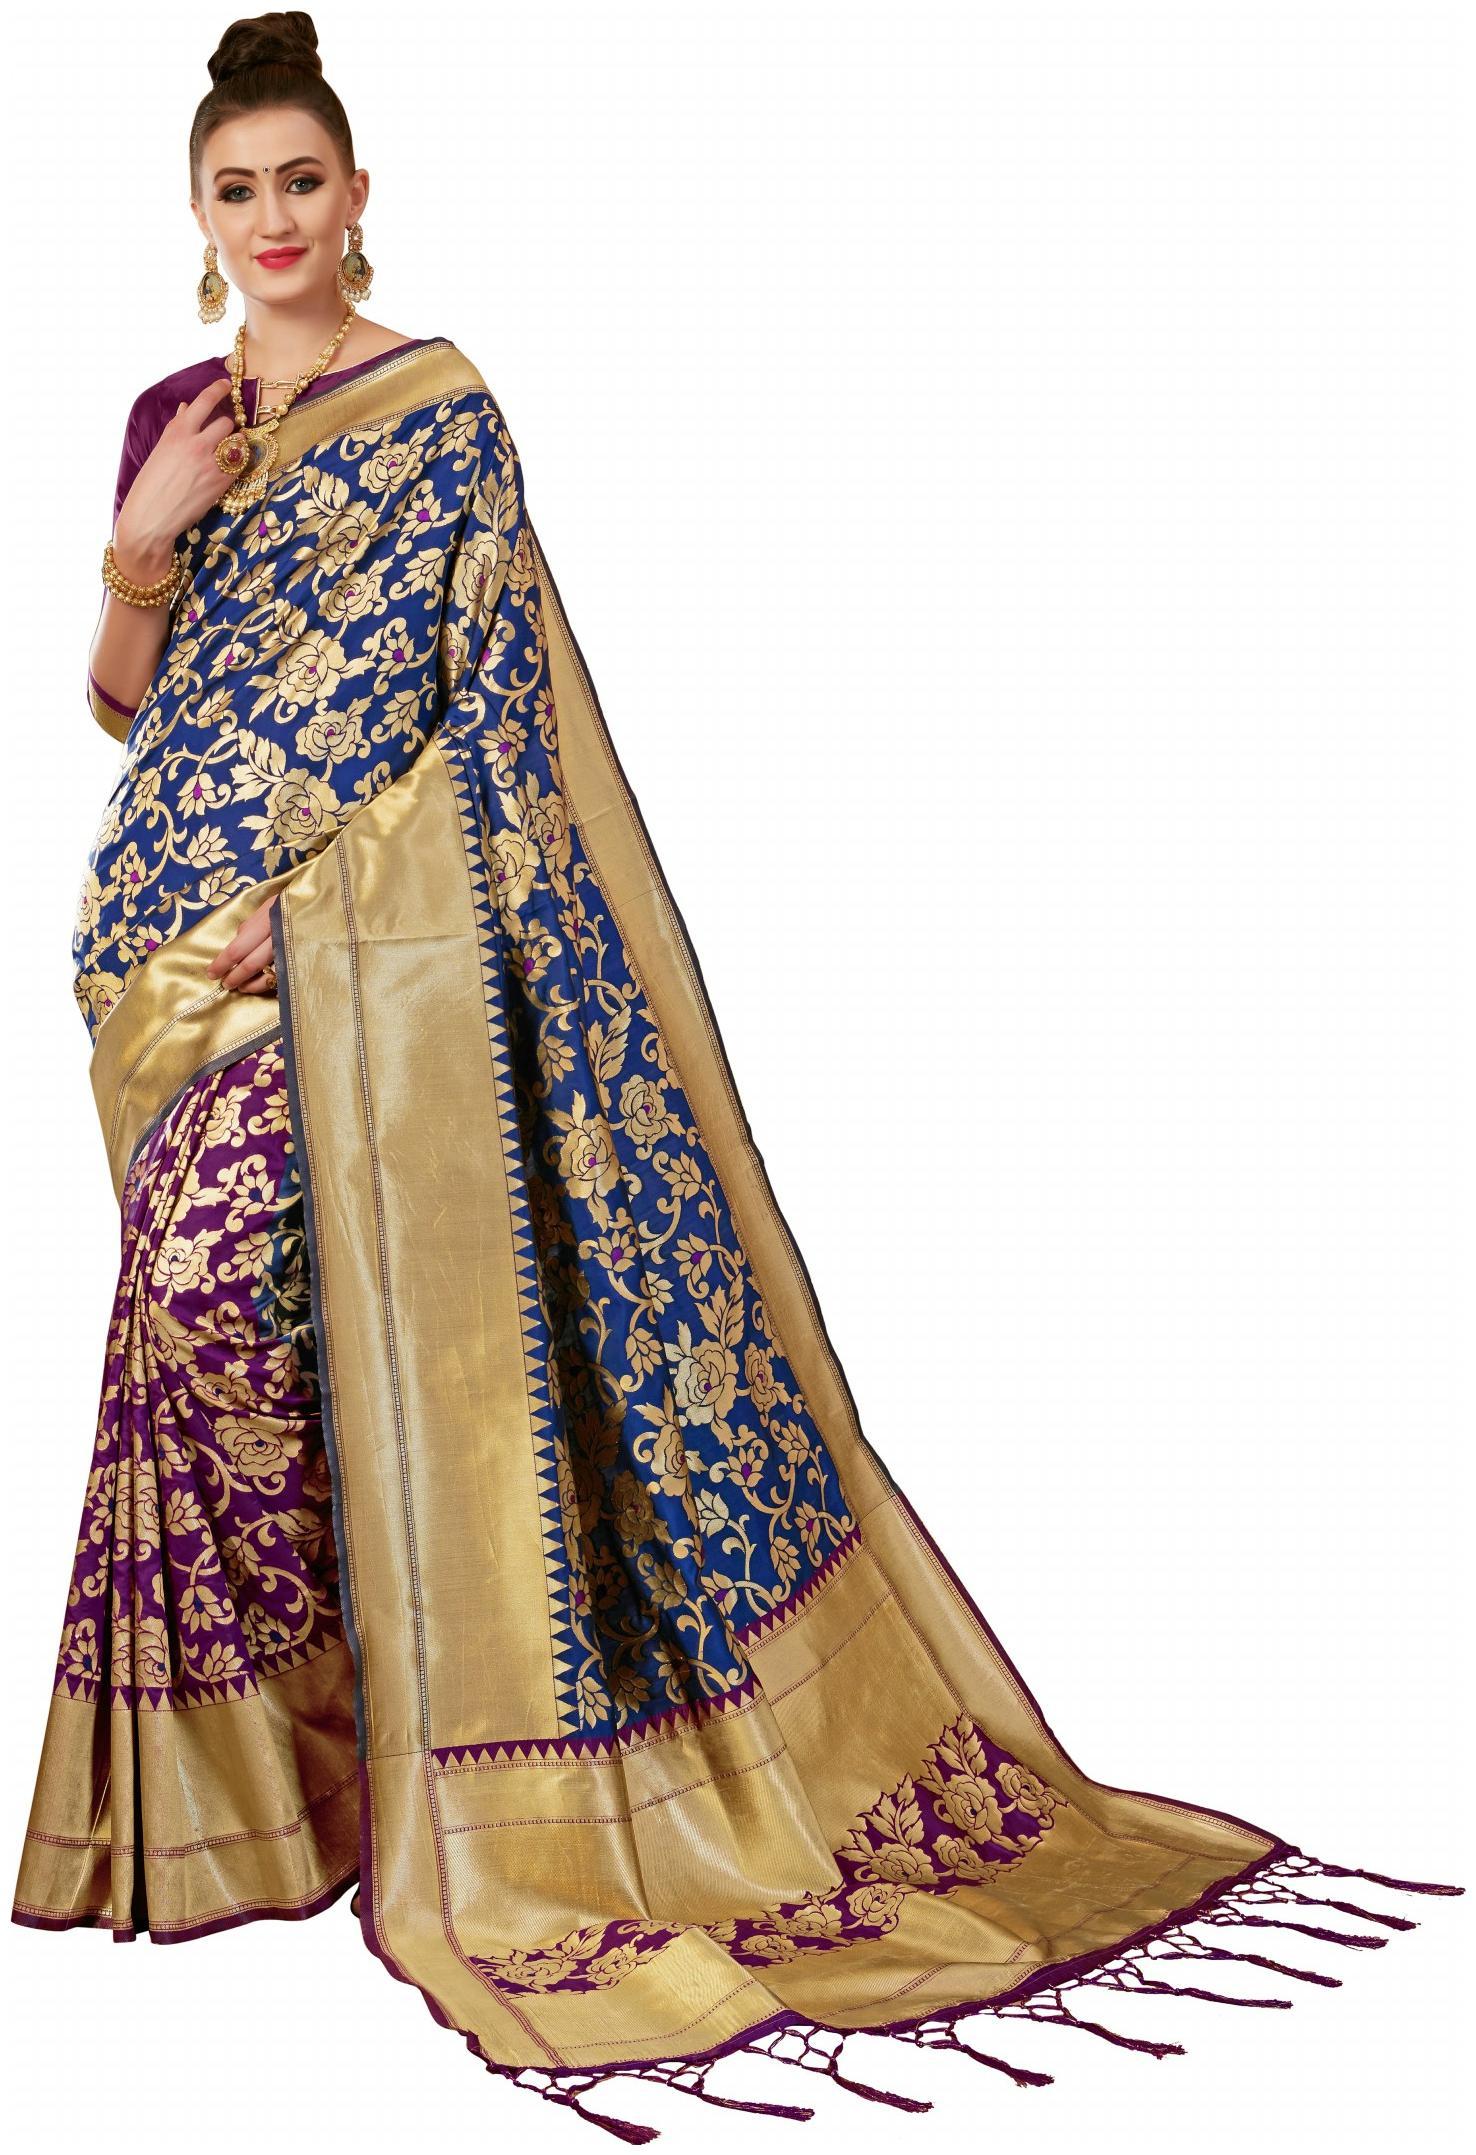 GENIUS CREATION Silk Banarasi Embroidered Work Saree - Multi